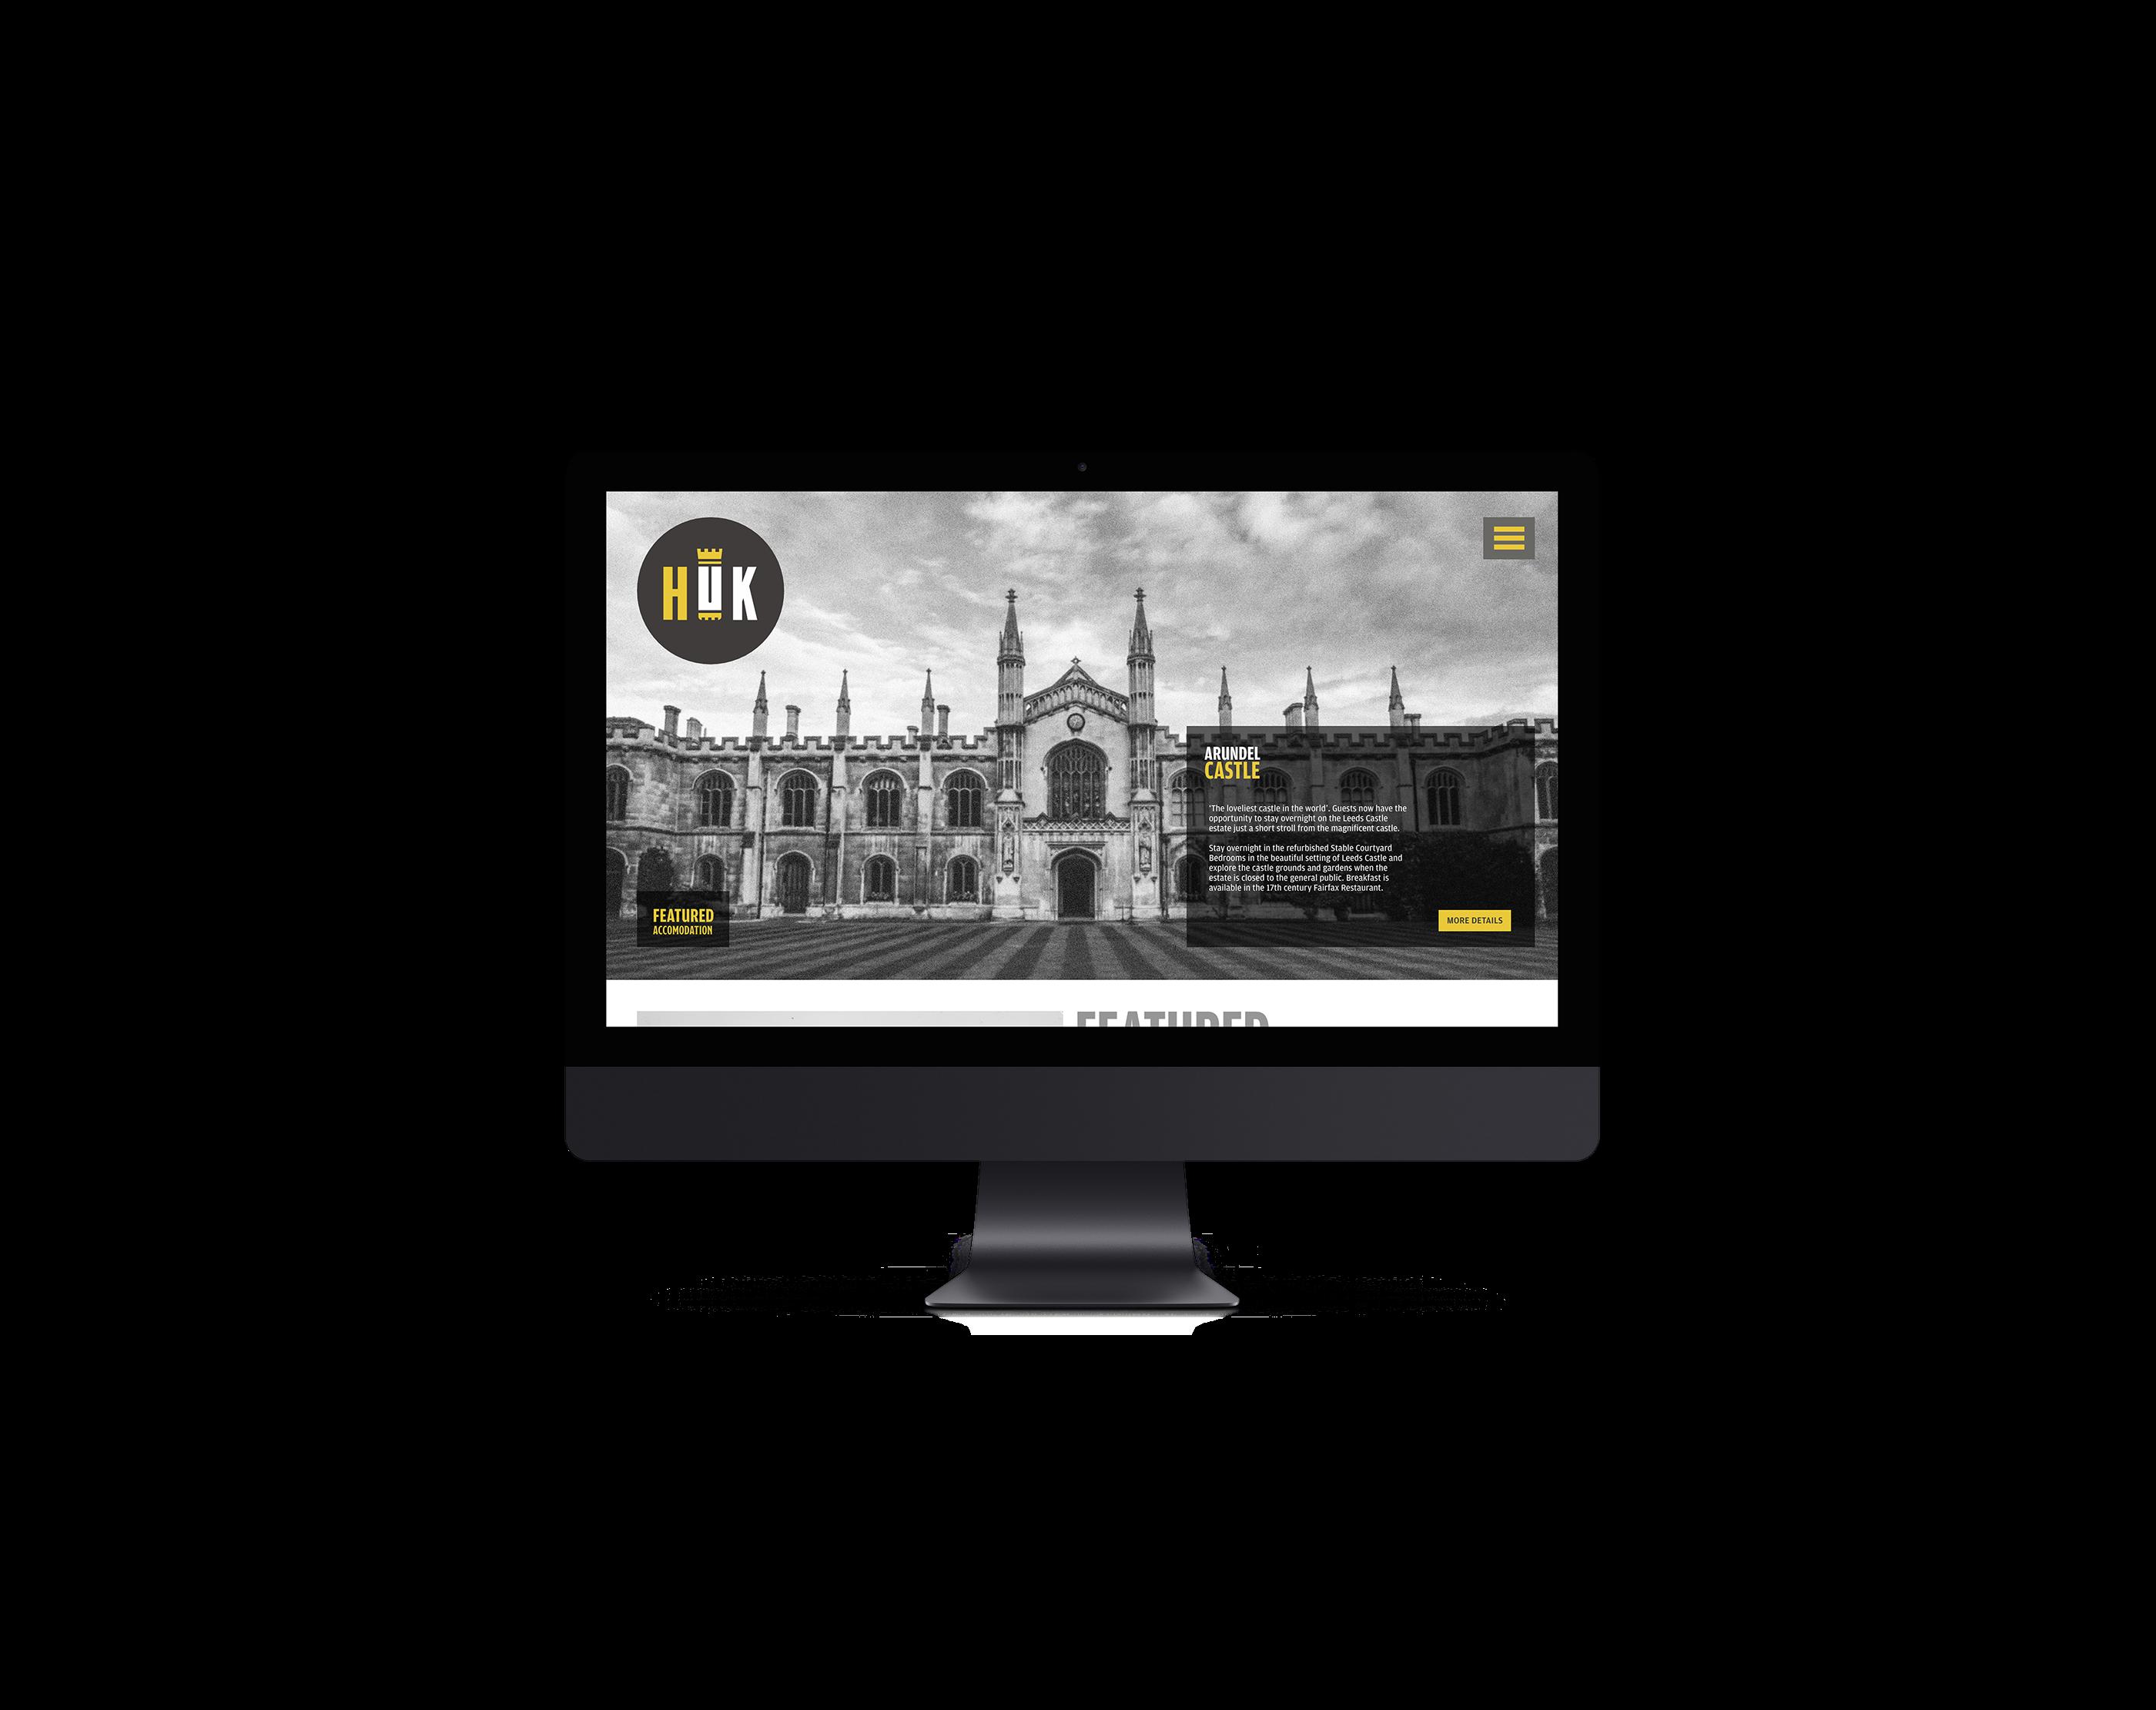 Huk Website Design On Behance